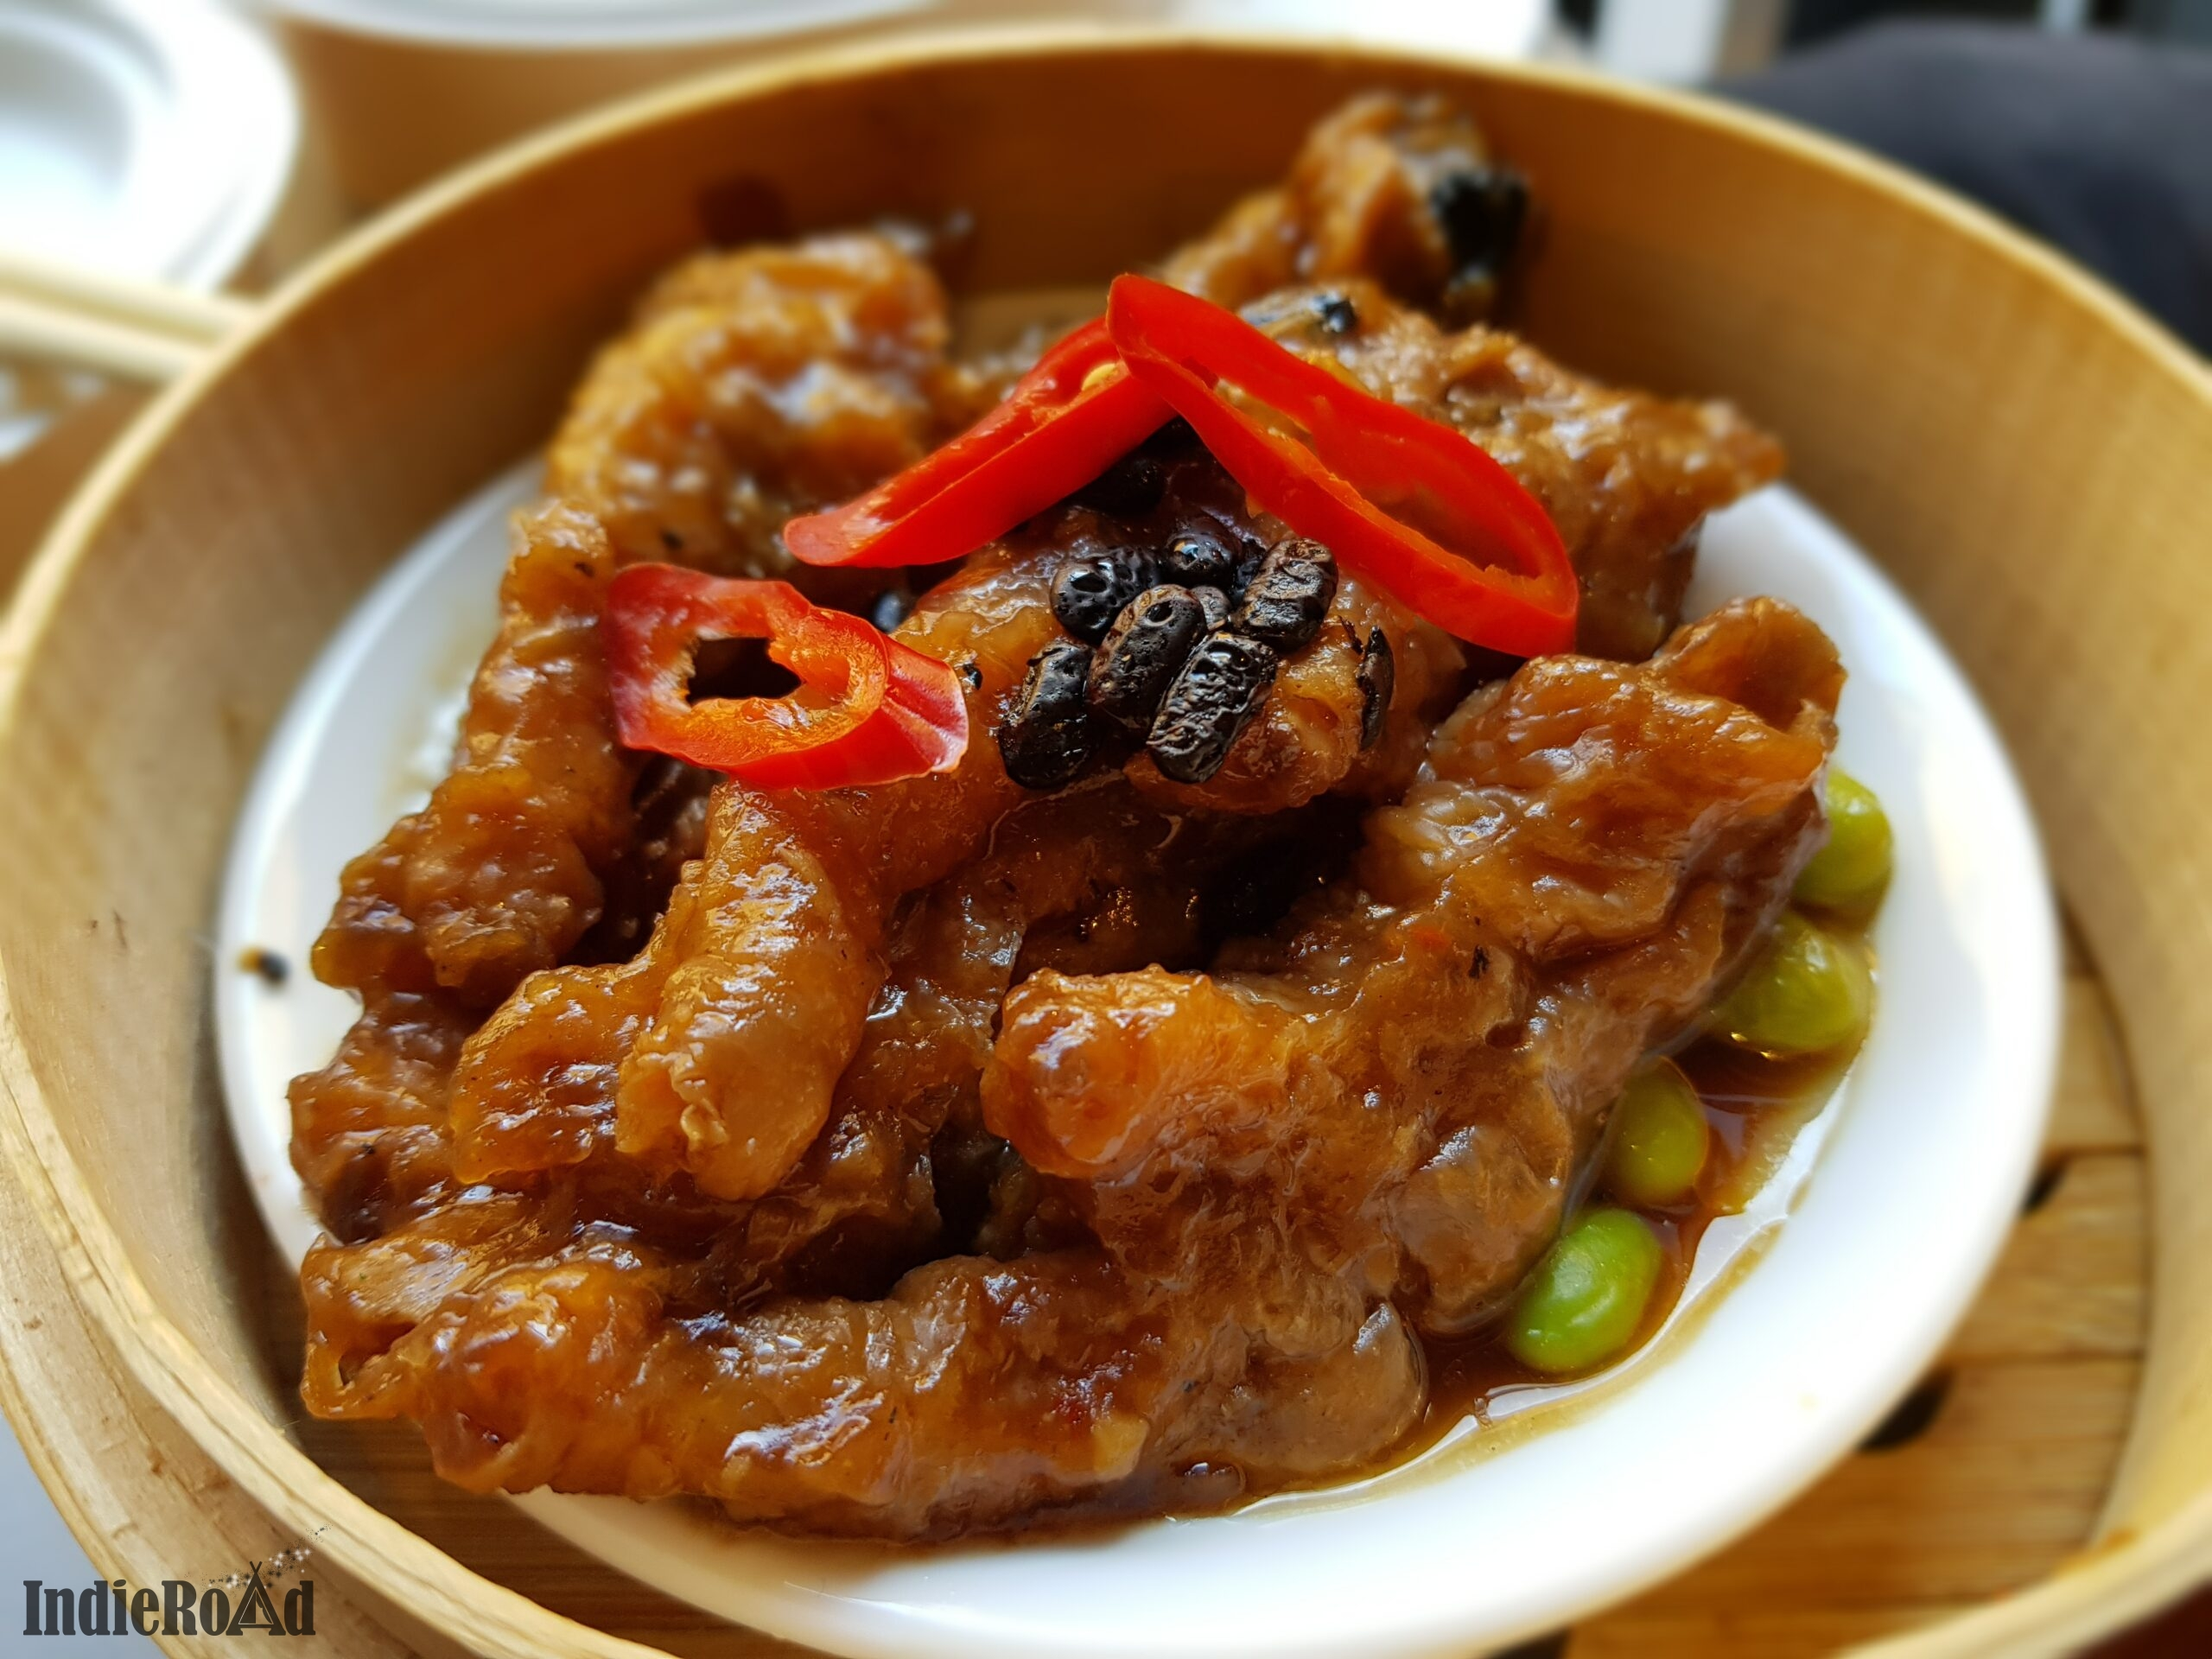 guida allo streetfood cinese paolo sarpi milano (4) mu ristorante